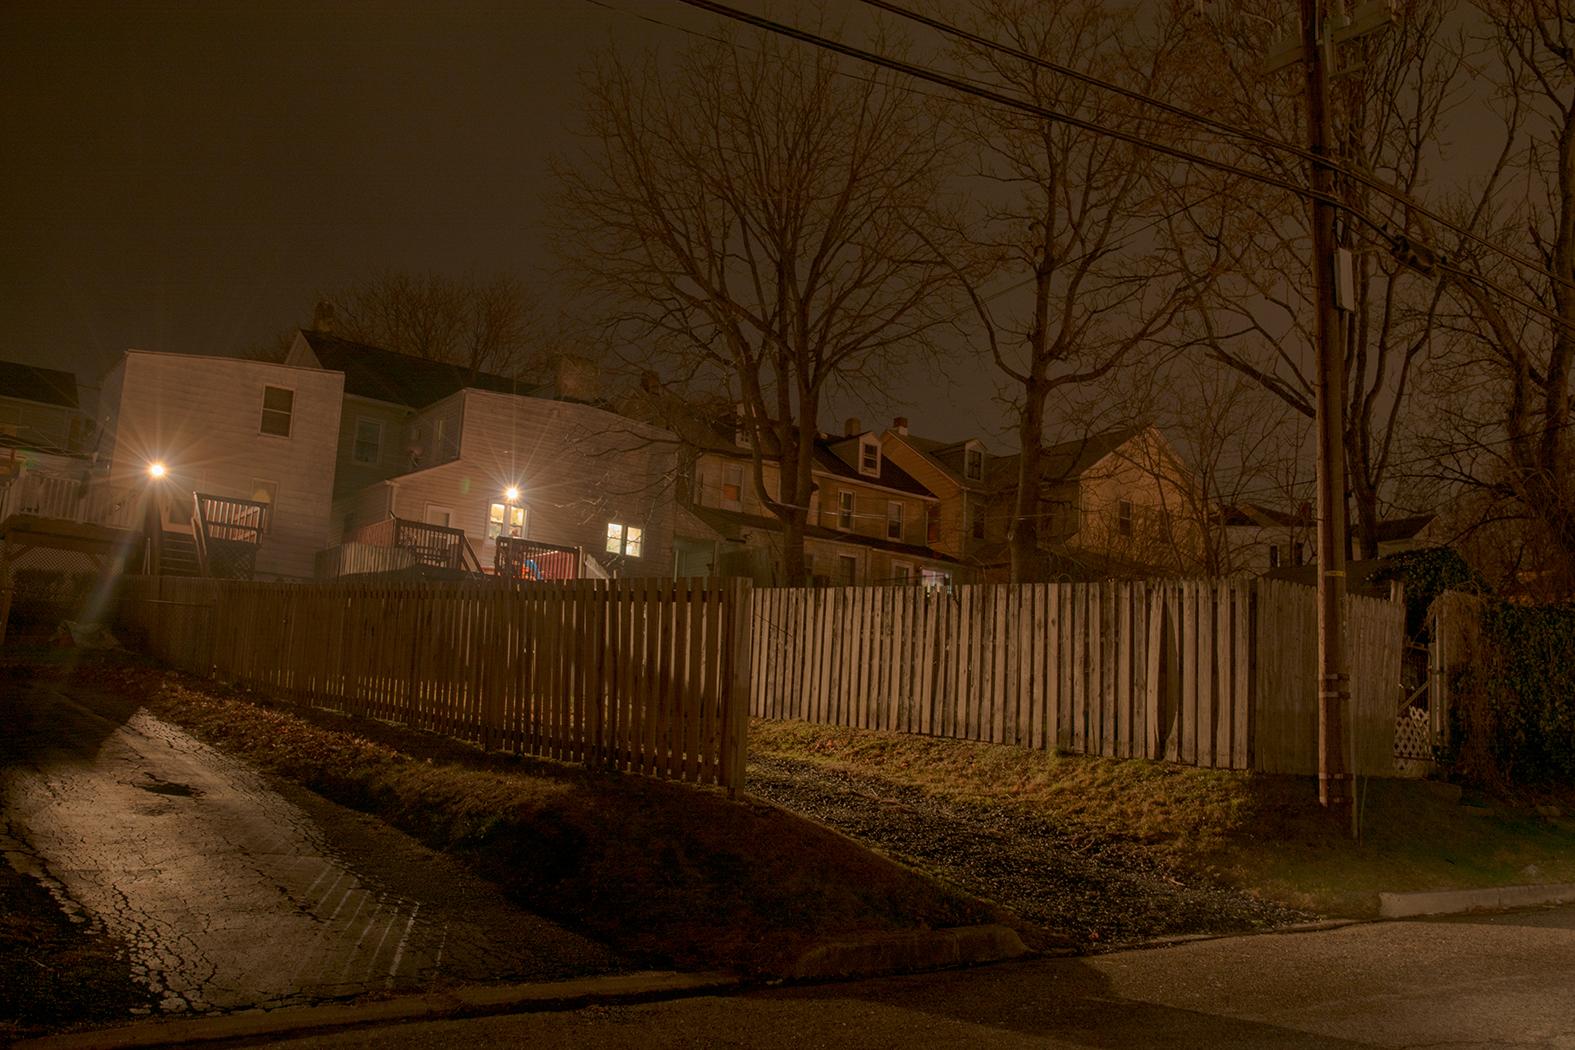 dark,hope,easton,pennsylvania,dark,light,photo noir